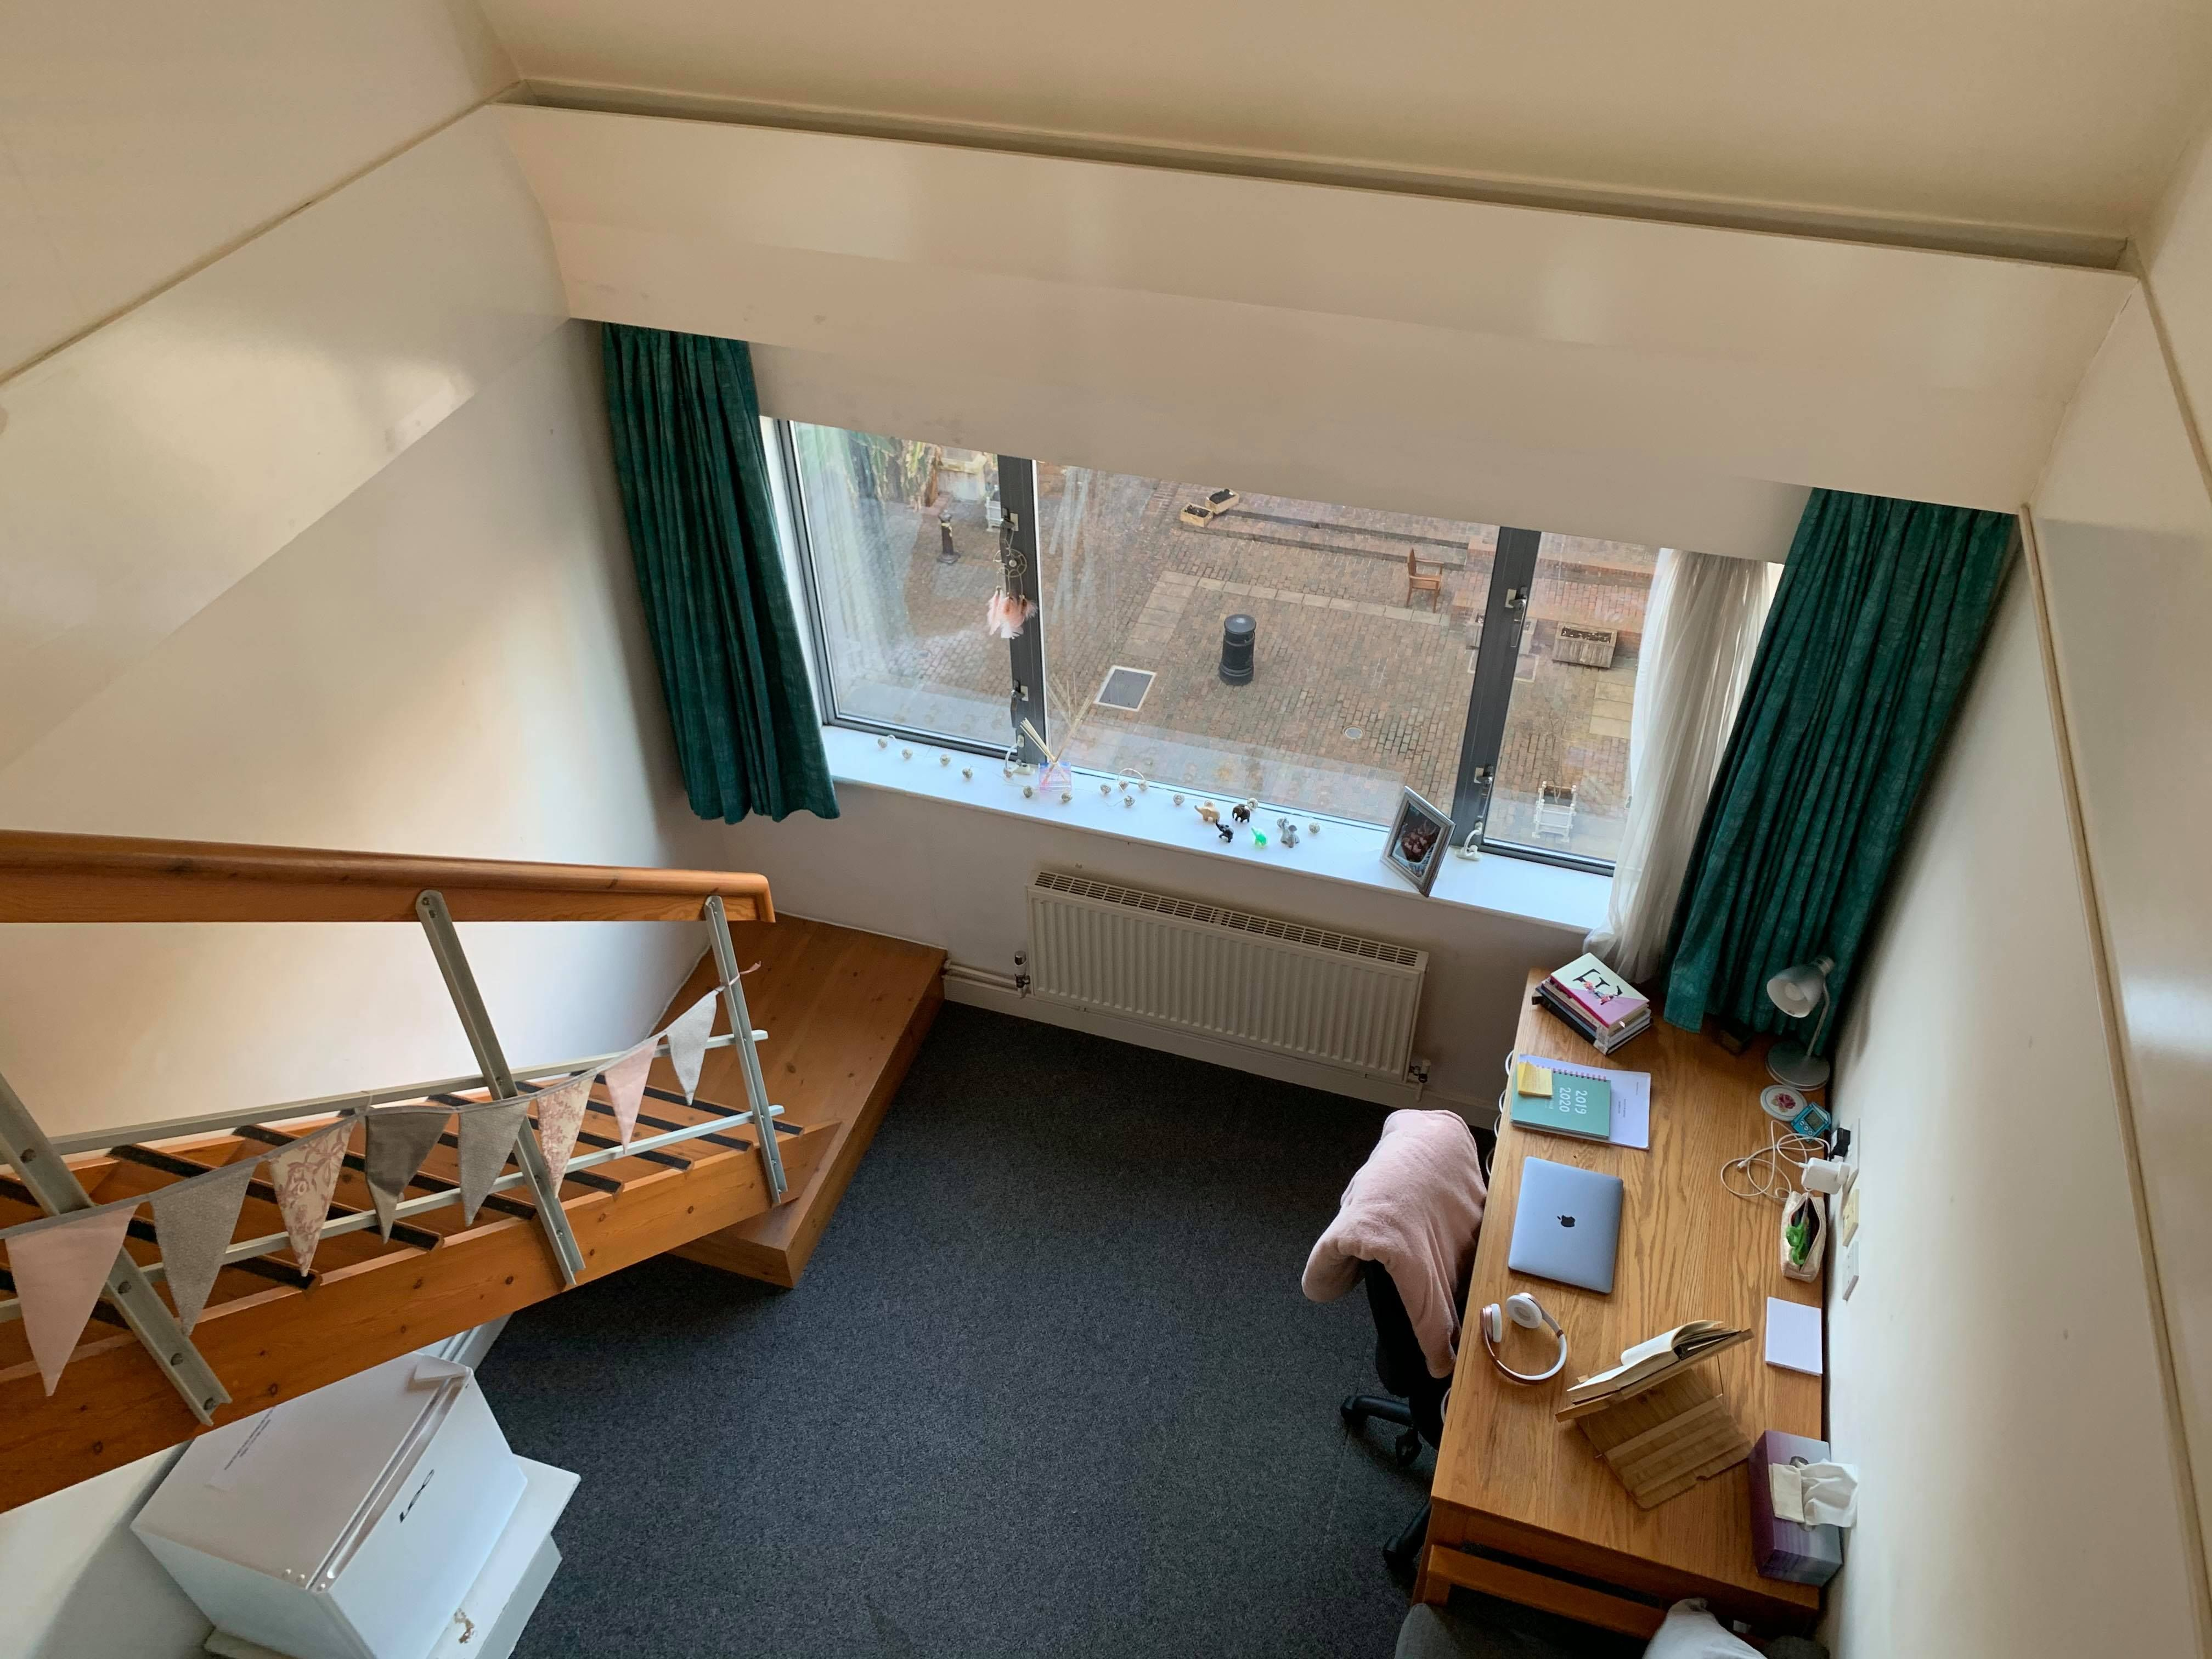 Image may contain: Hostel, Dorm Room, Plywood, Floor, Hardwood, Living Room, Indoors, Bedroom, Room, Flooring, Wood, Housing, Building